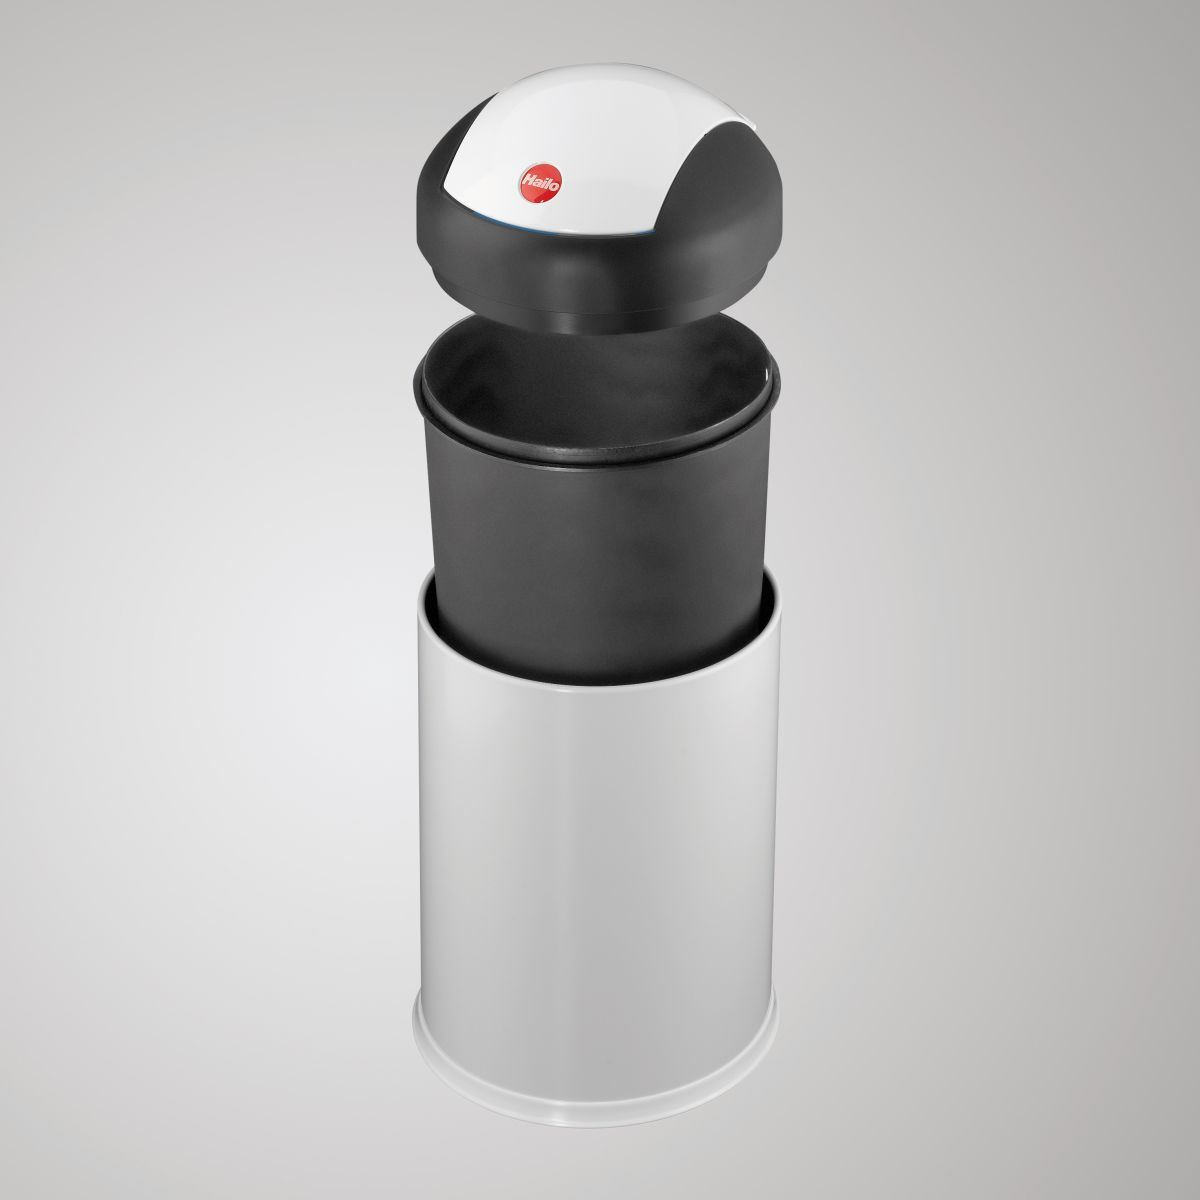 Hailo sienna swing lid 4 litre sanitary bathroom bin for Grey bathroom bin